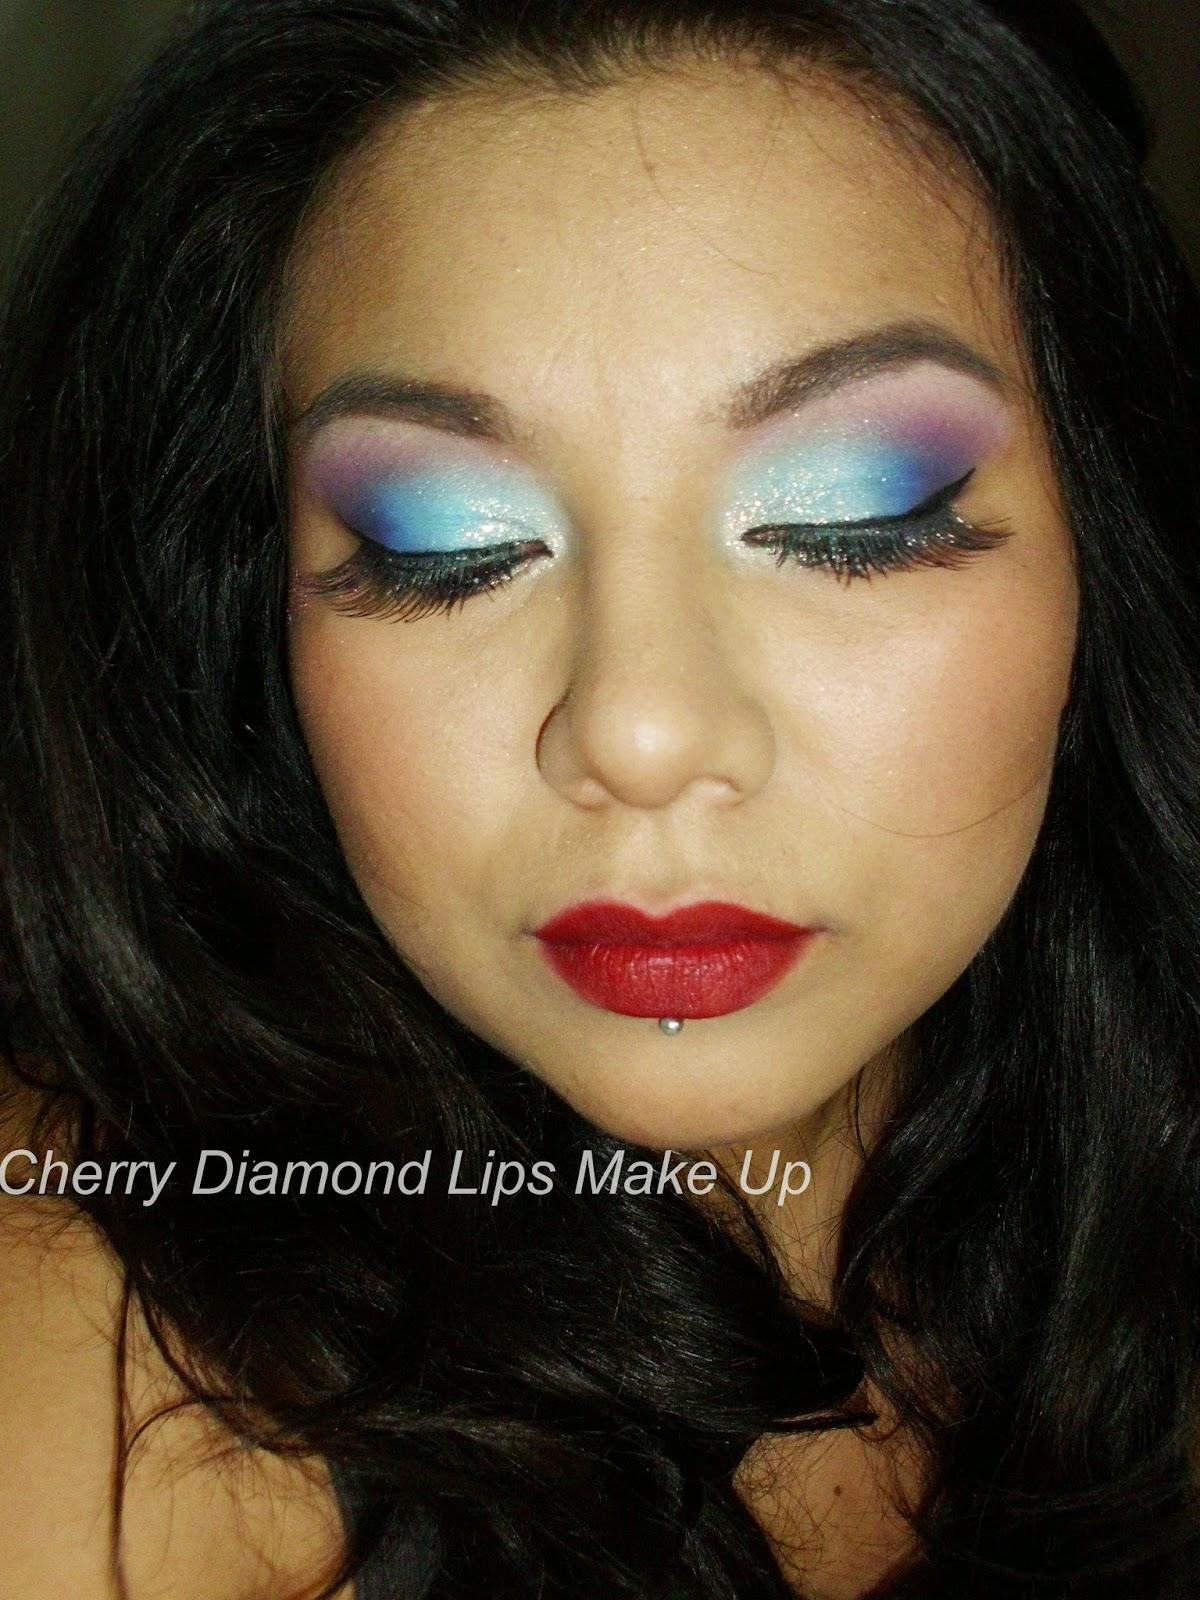 Linda Hallberg, Paciugopedia, Beauty Bats, Catrice Cosmetics, Kiko Cosmetics, Fraulein 38, 030 Berryson Ford